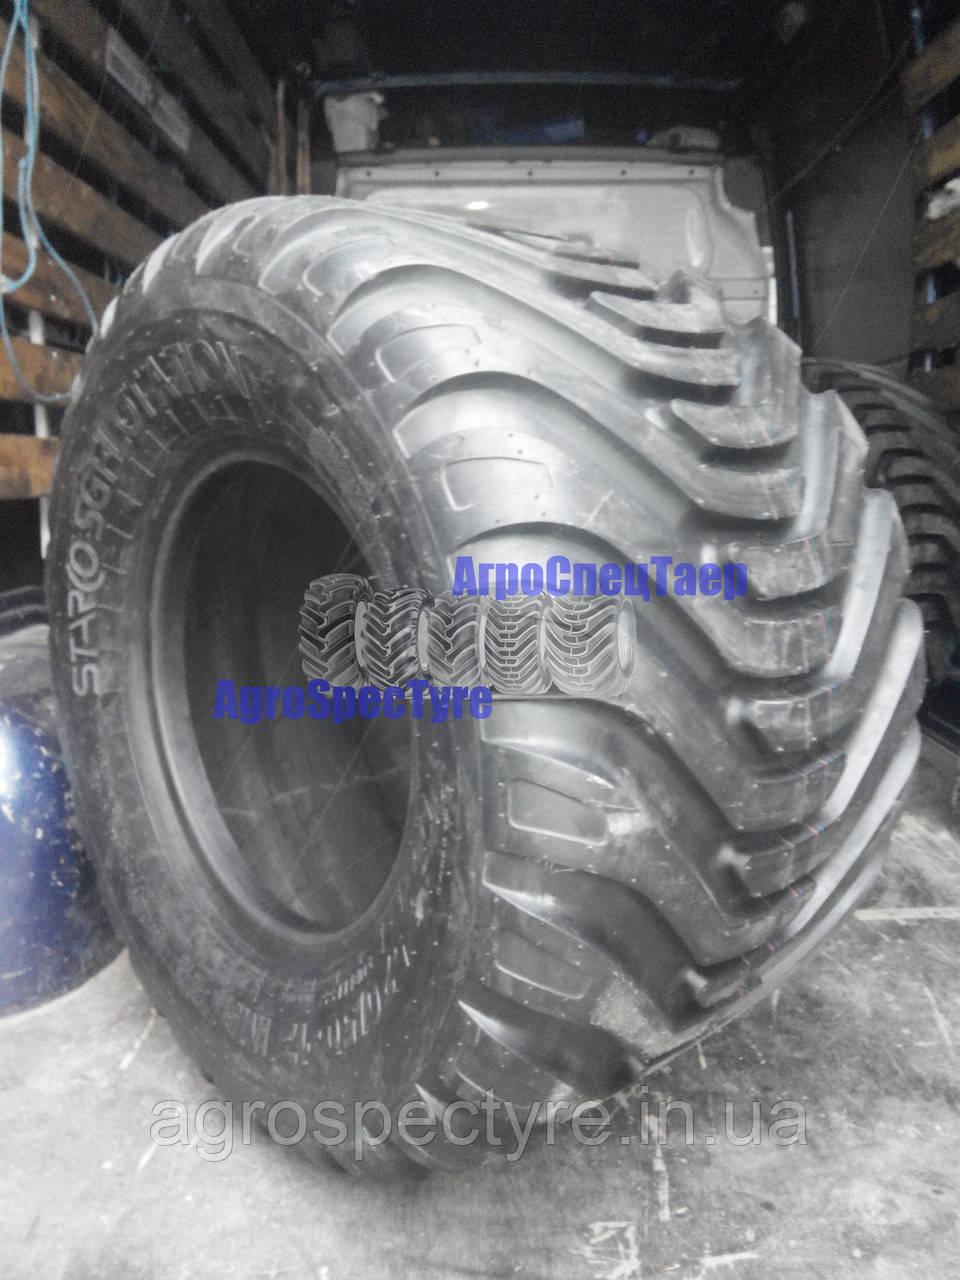 Сельхоз шина 550/45 - 22.5 328 VALUE PLUS 16PR (159 A8/147 A8) TL Alliance